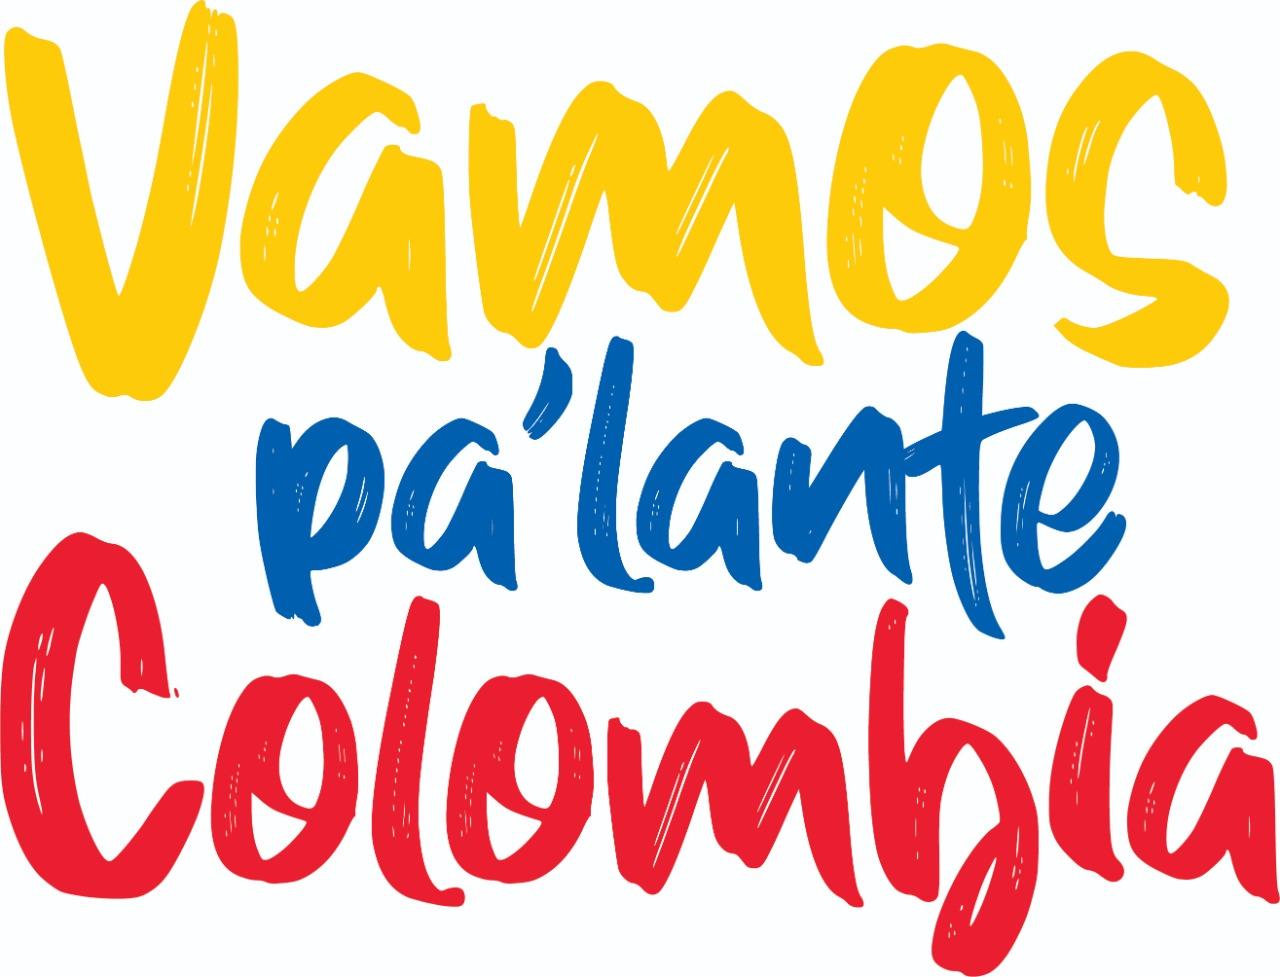 Festival Independencia Orgullo Colombiano en Chicago